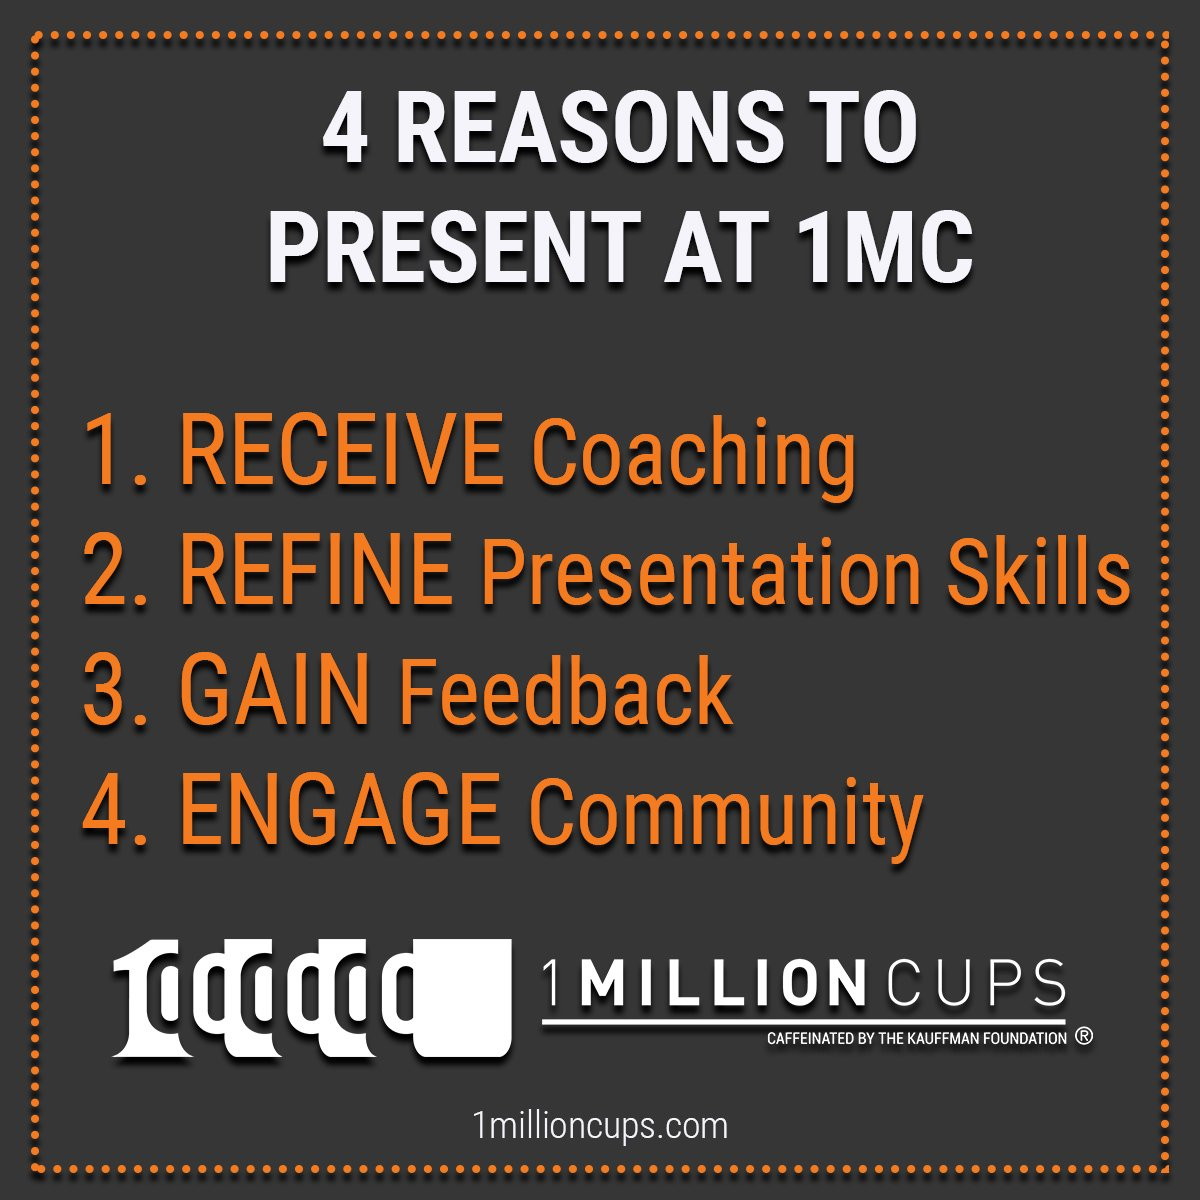 Reasons to Present.jpg